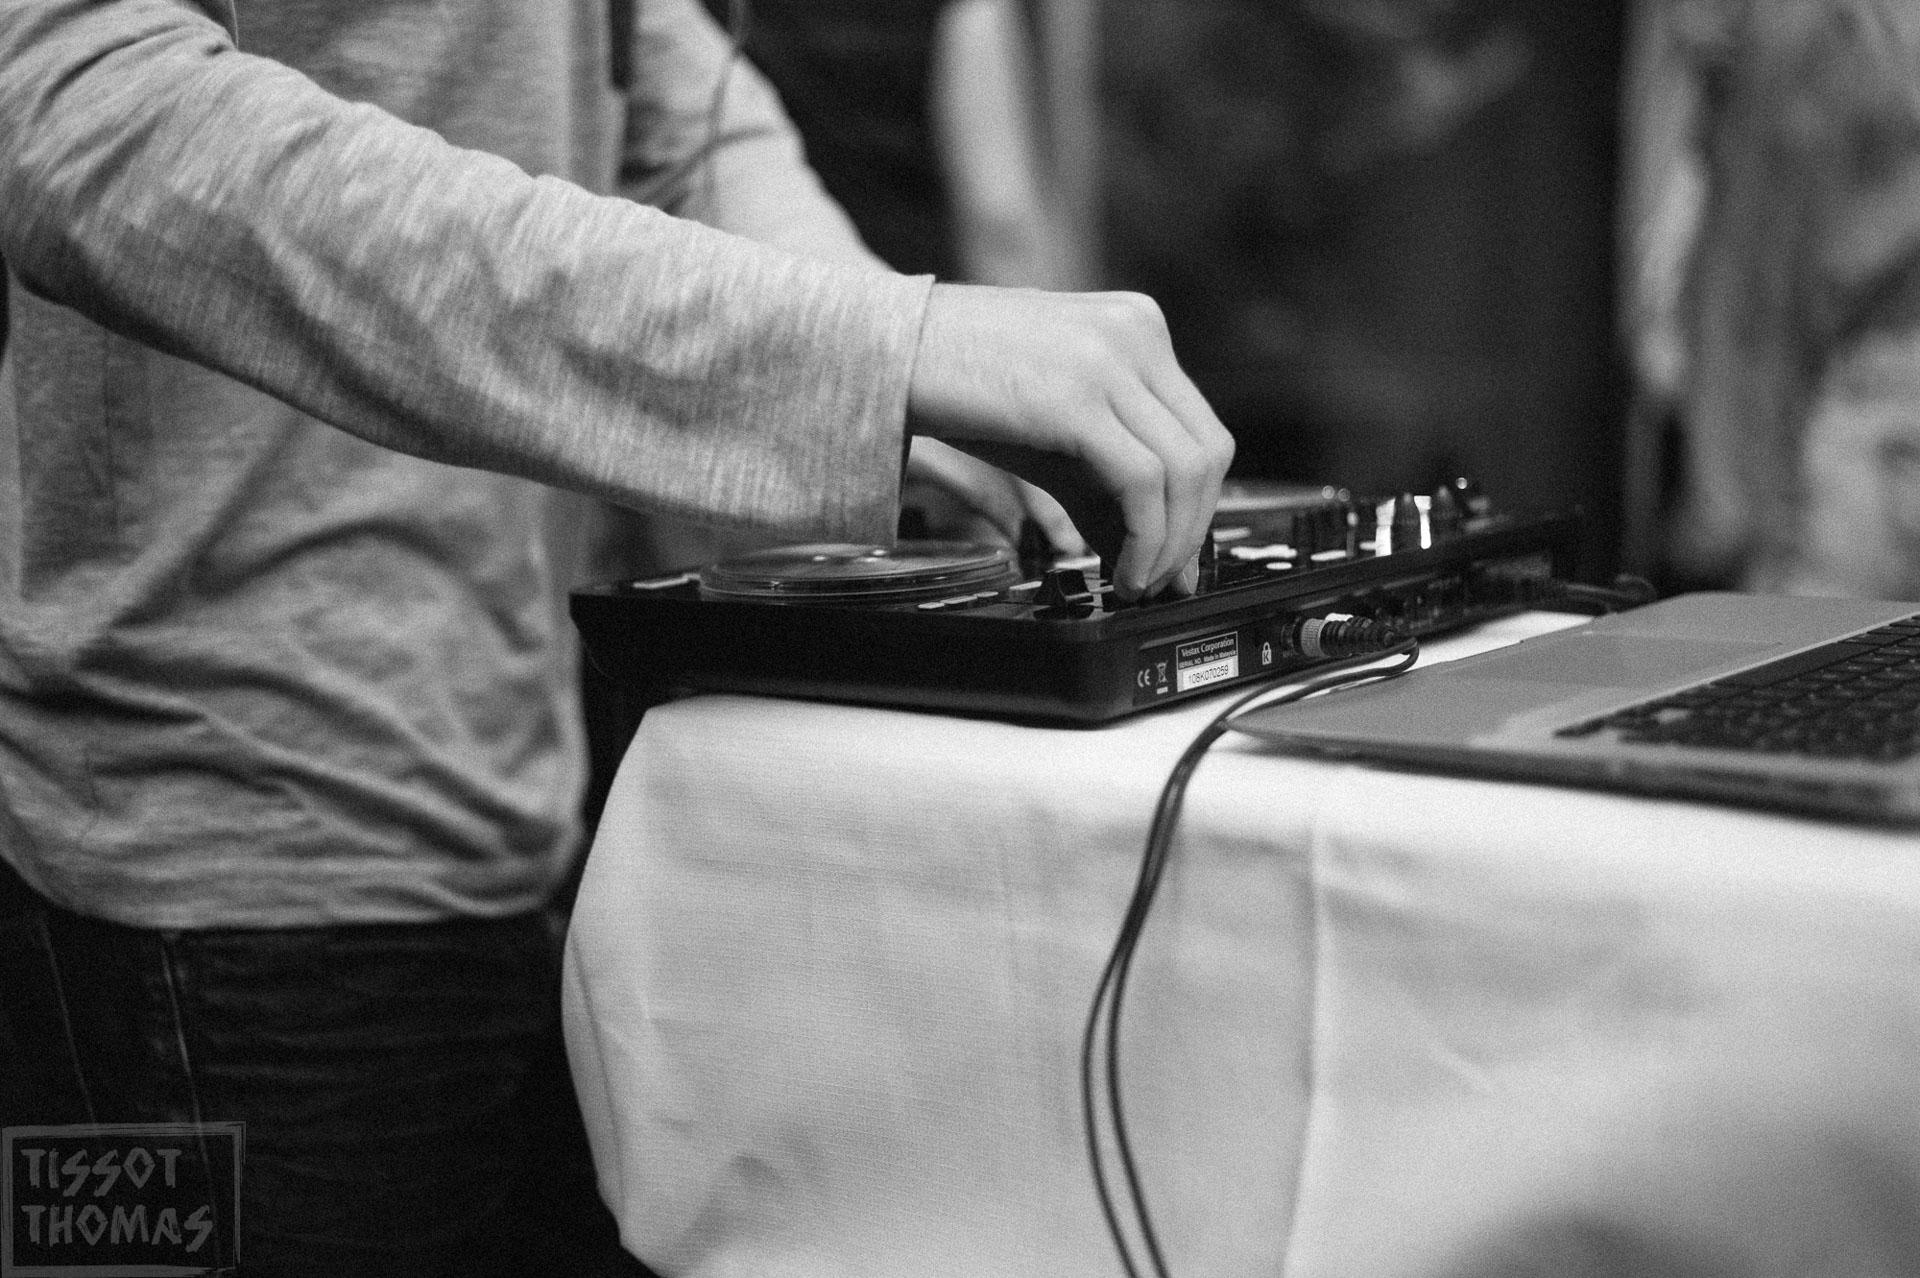 kiki musik festival, afterwork de kiki, afterwork paris, afterwork gay